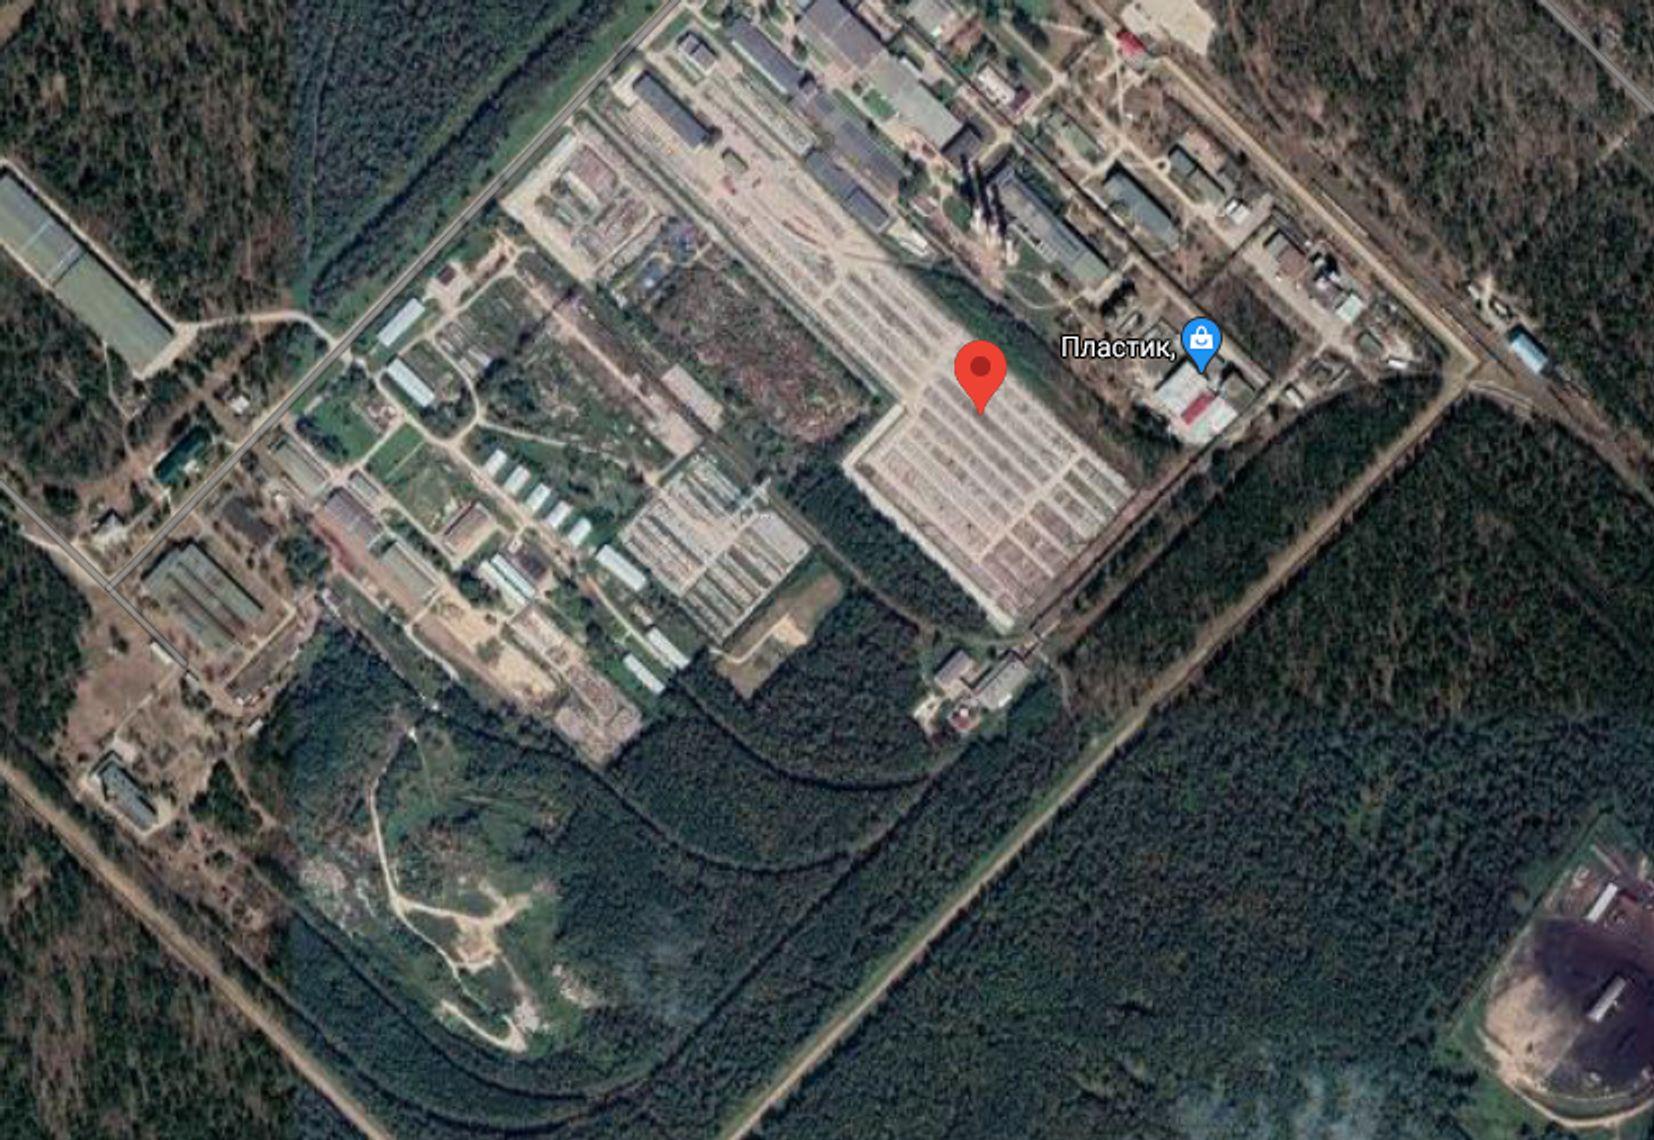 Ангарский электролизный химический комбинат, Ангарск 52.457548, 103.897017